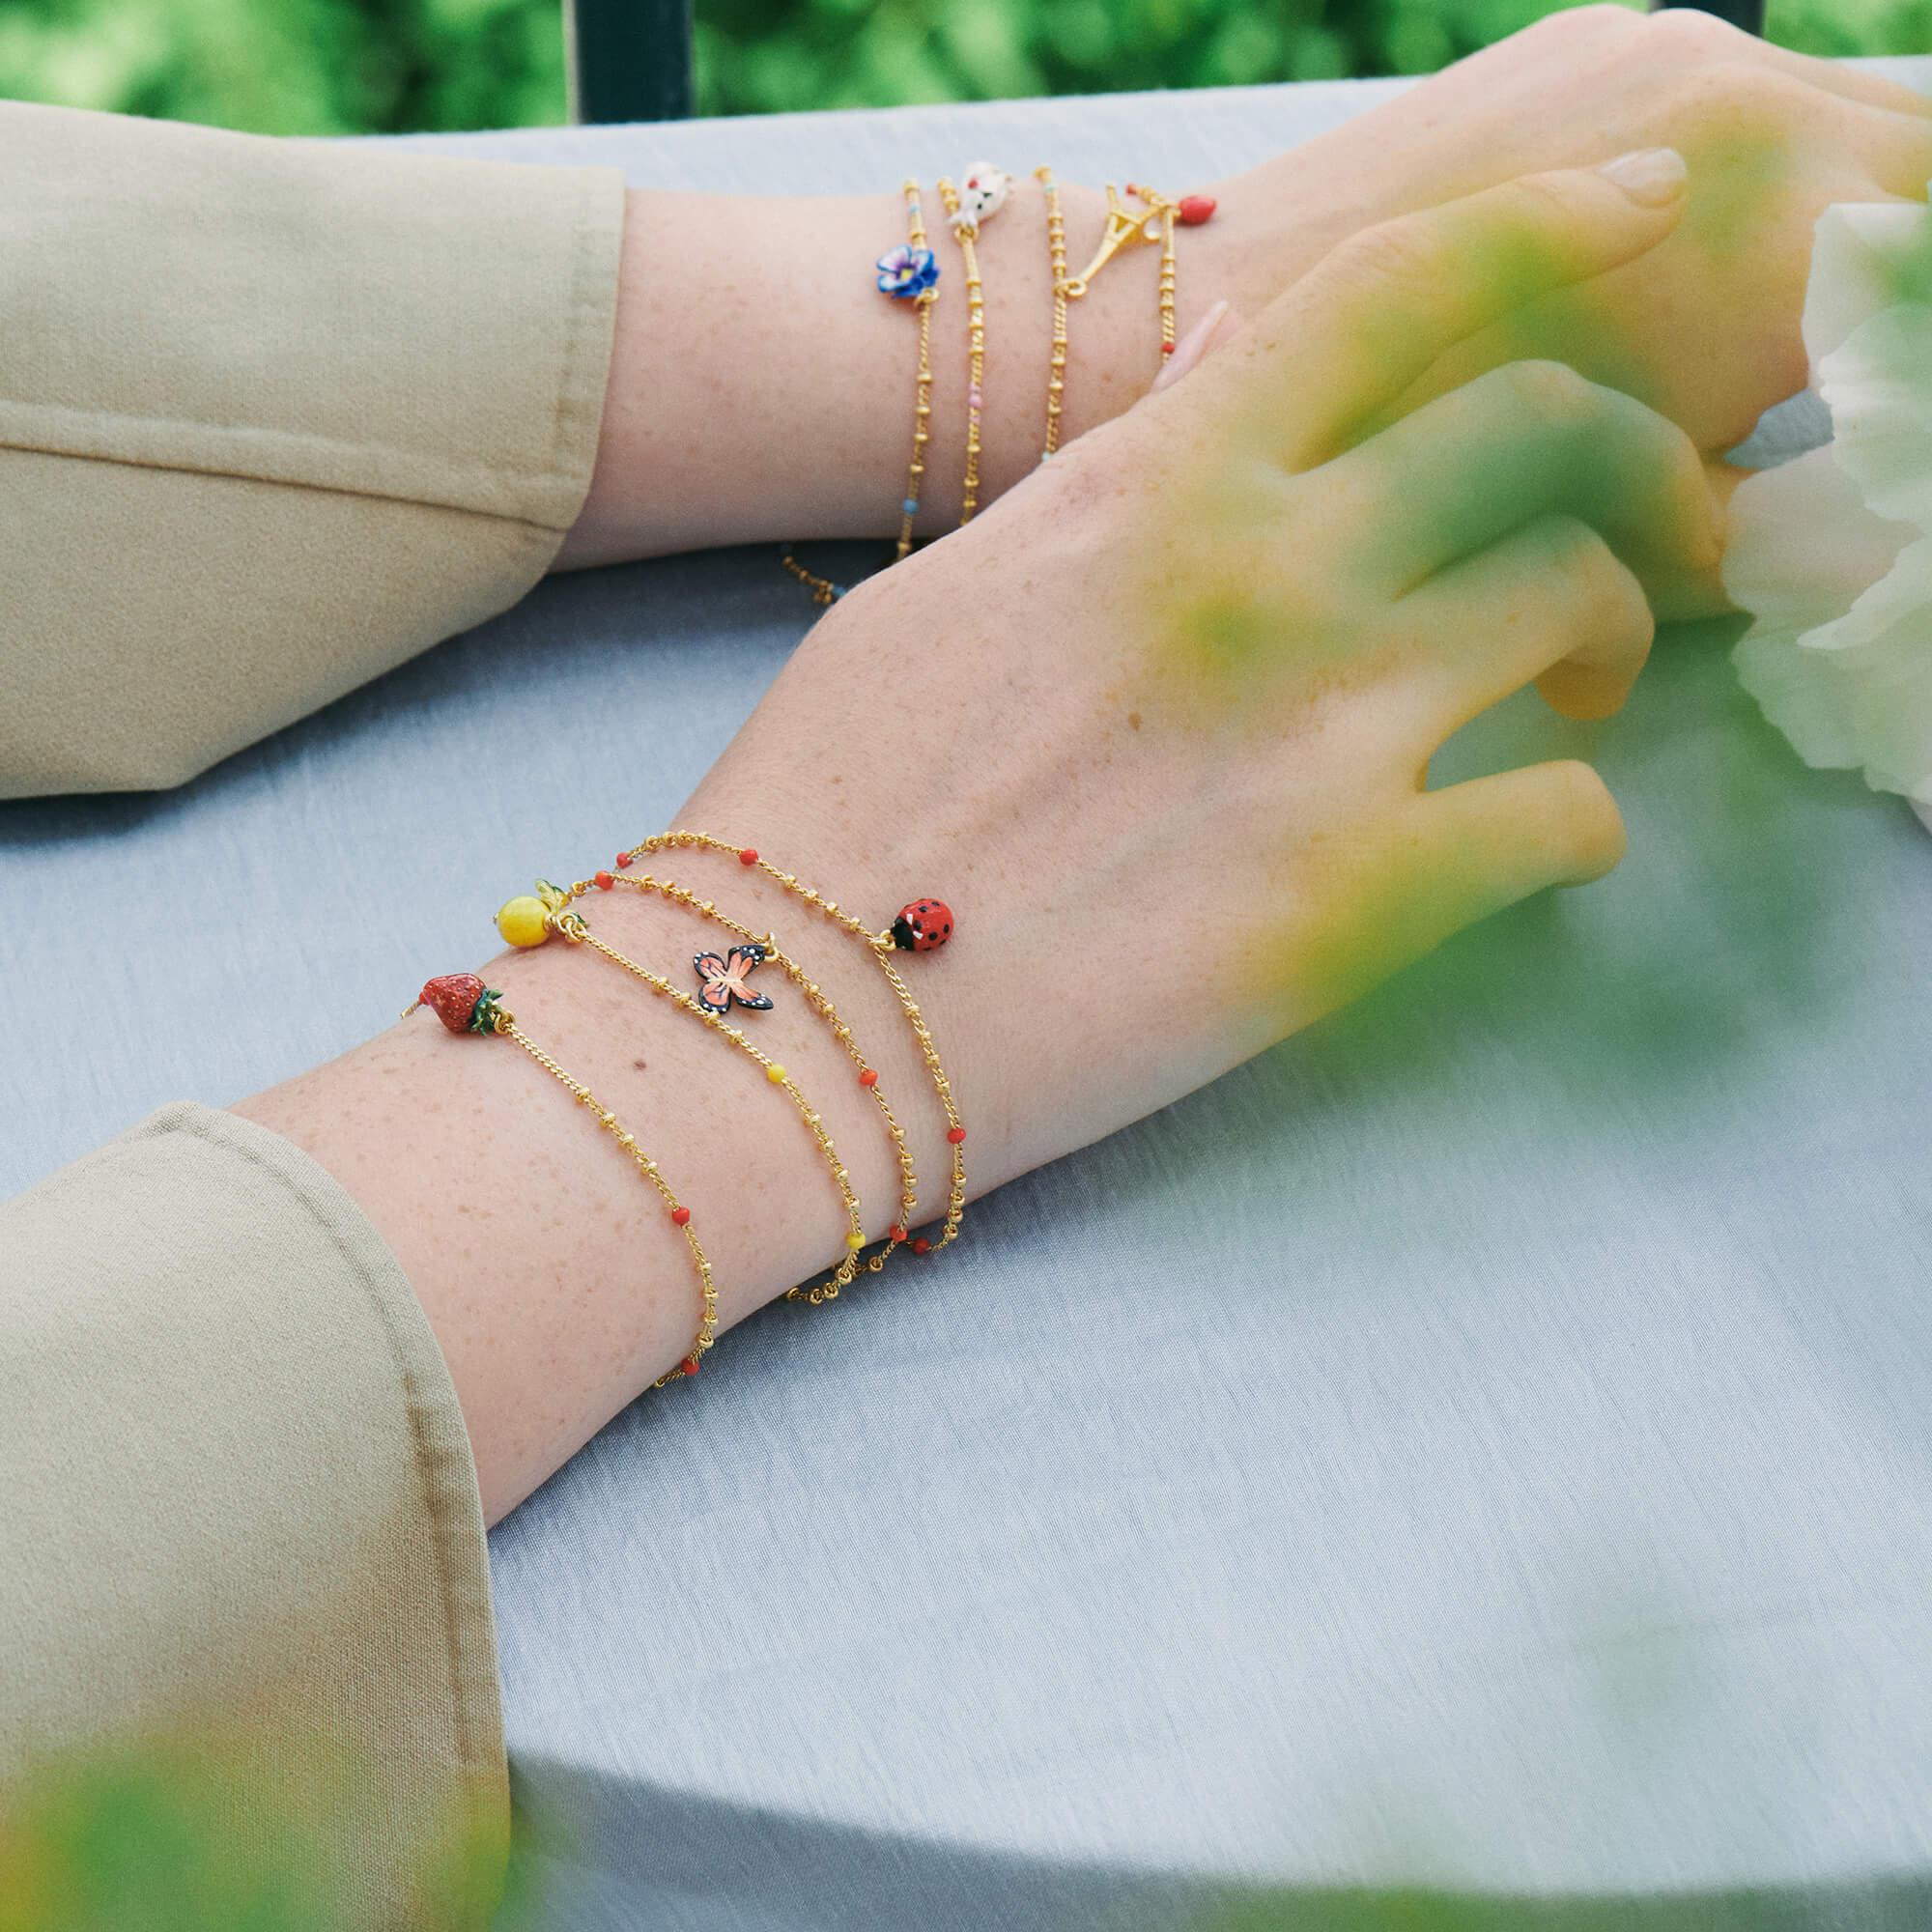 Les Nereides Charm Bracelets